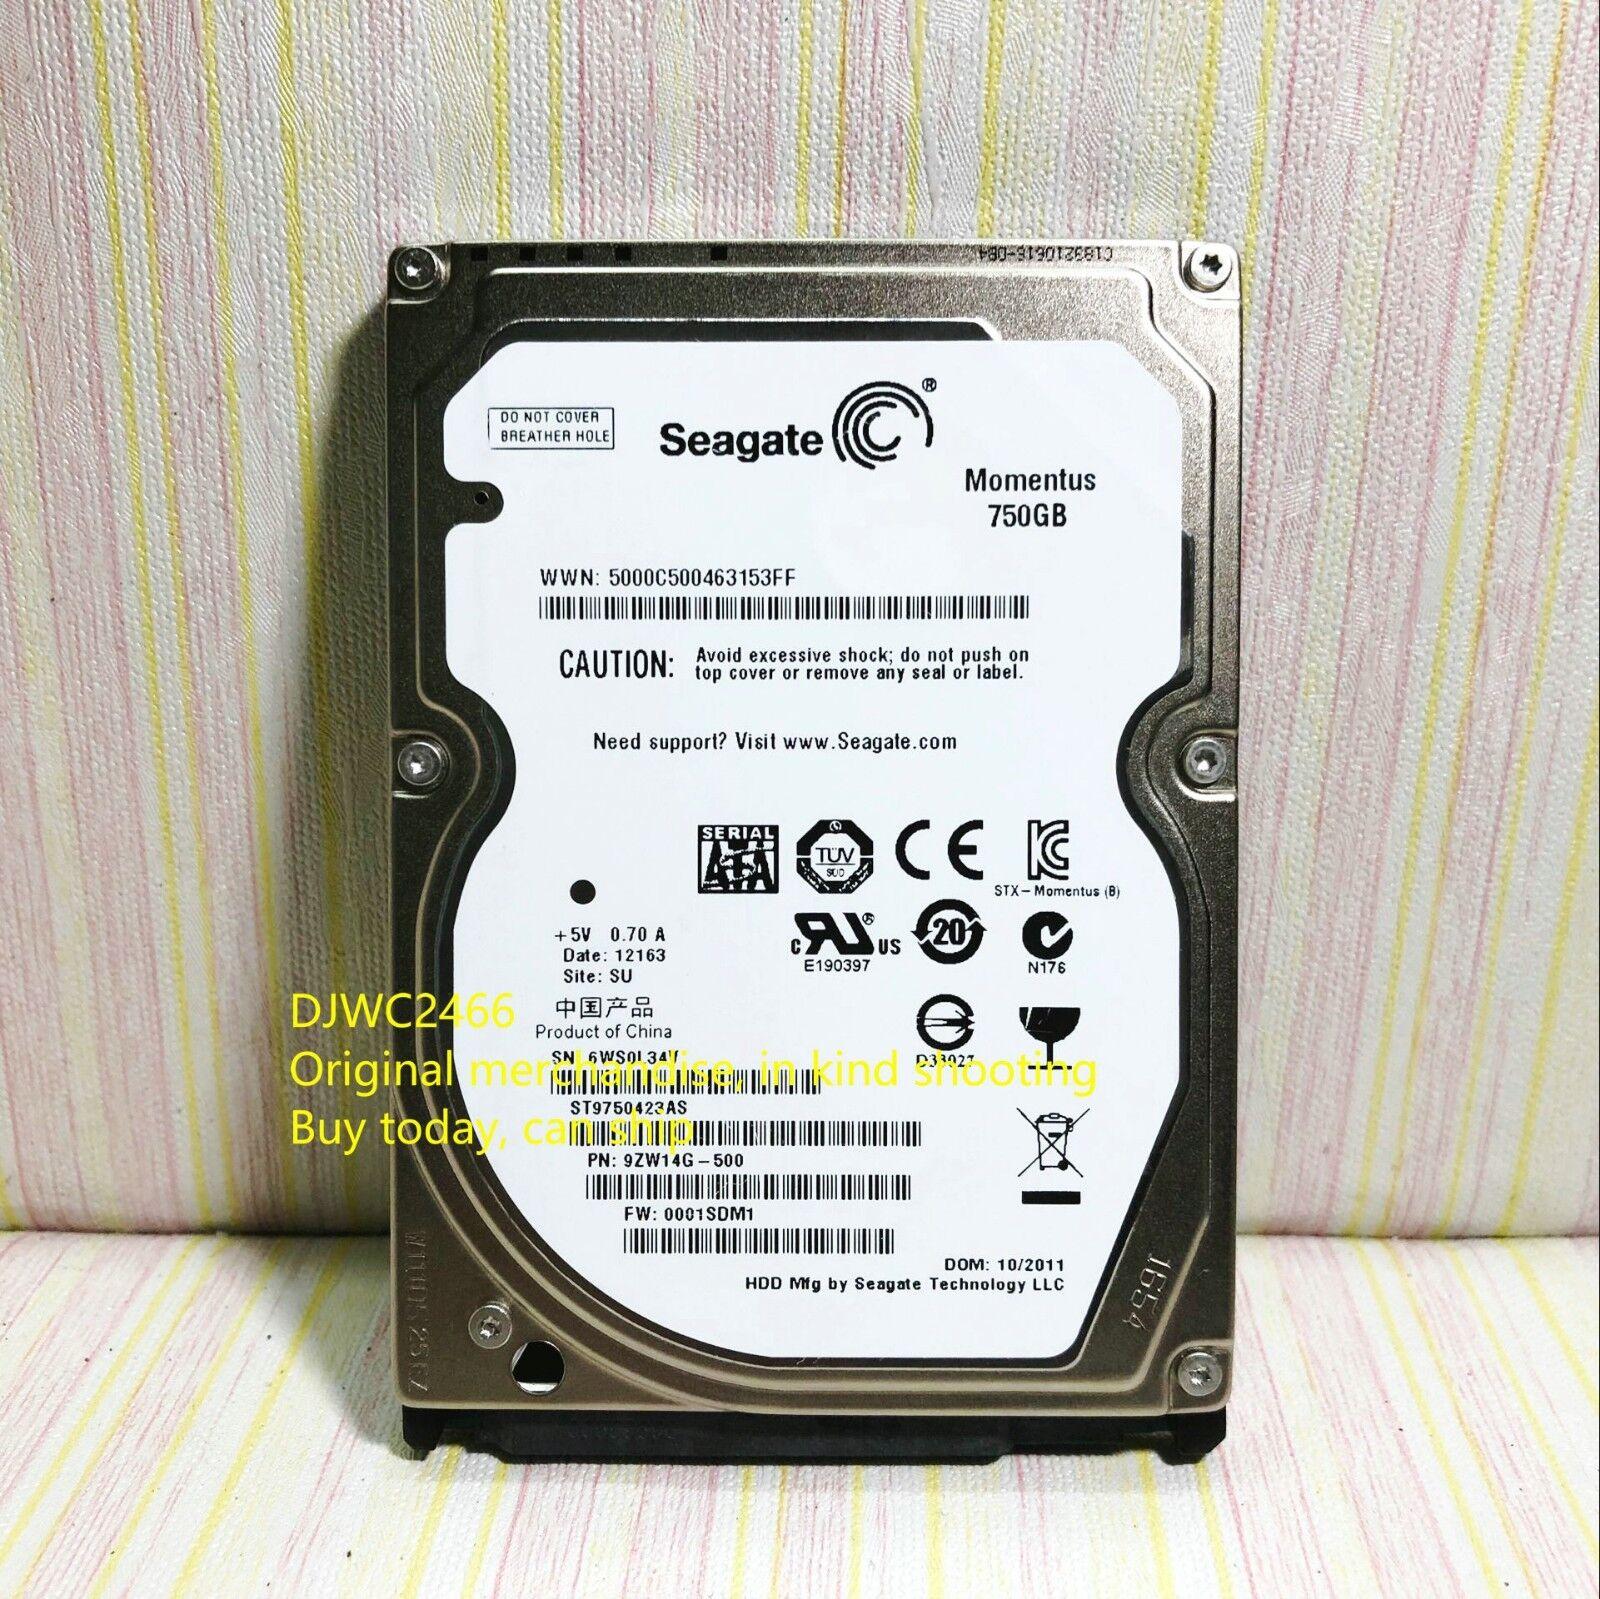 Seagate Momentus 750GB,Internal,7200RPM,2 5